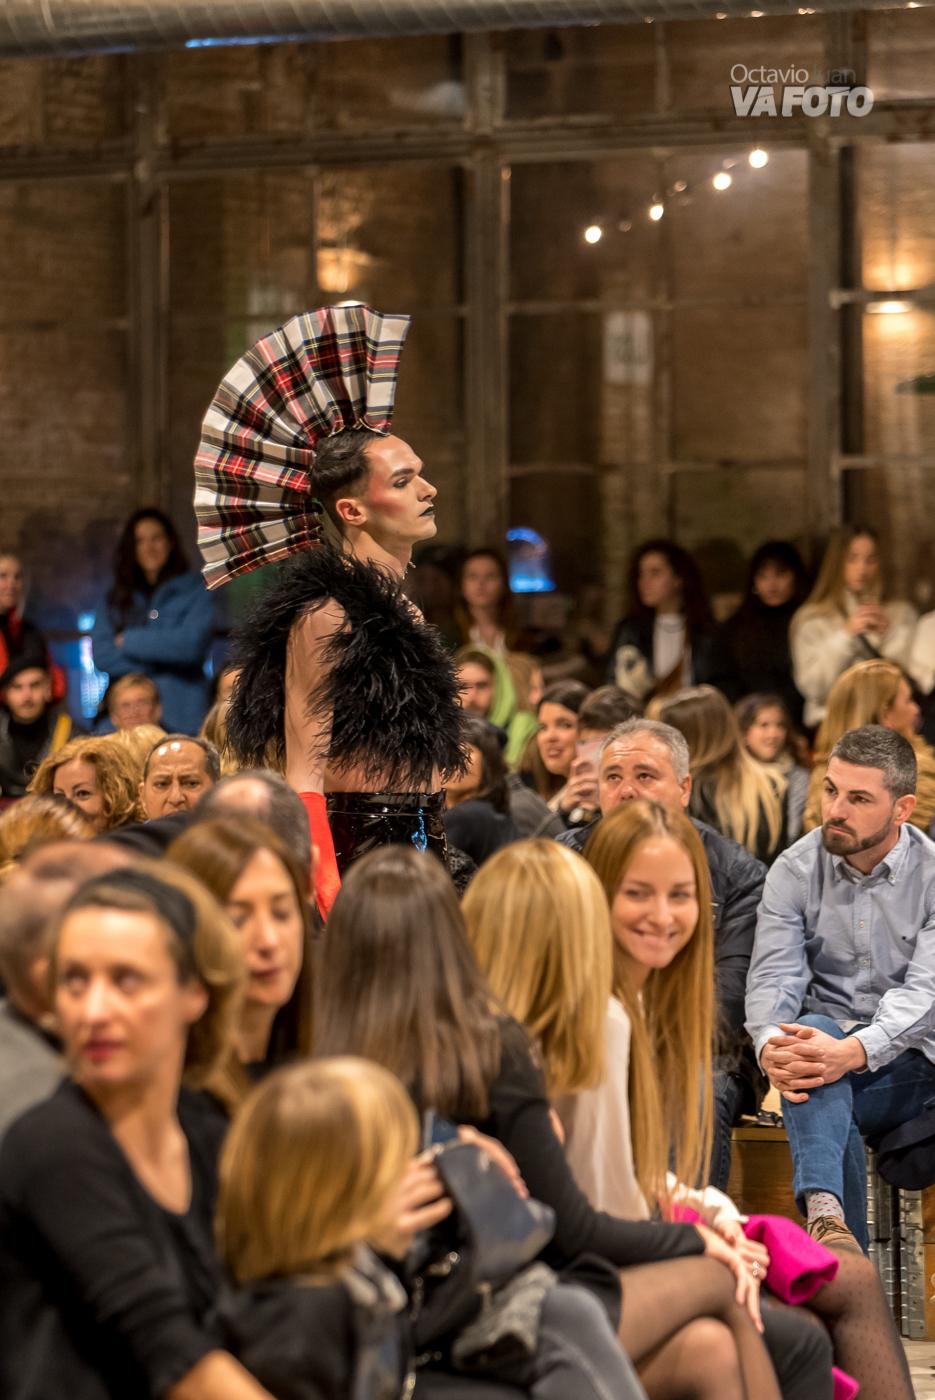 00120 ARTEMODA DSC4219 20181124 - Evento: Arte + Moda Valencia